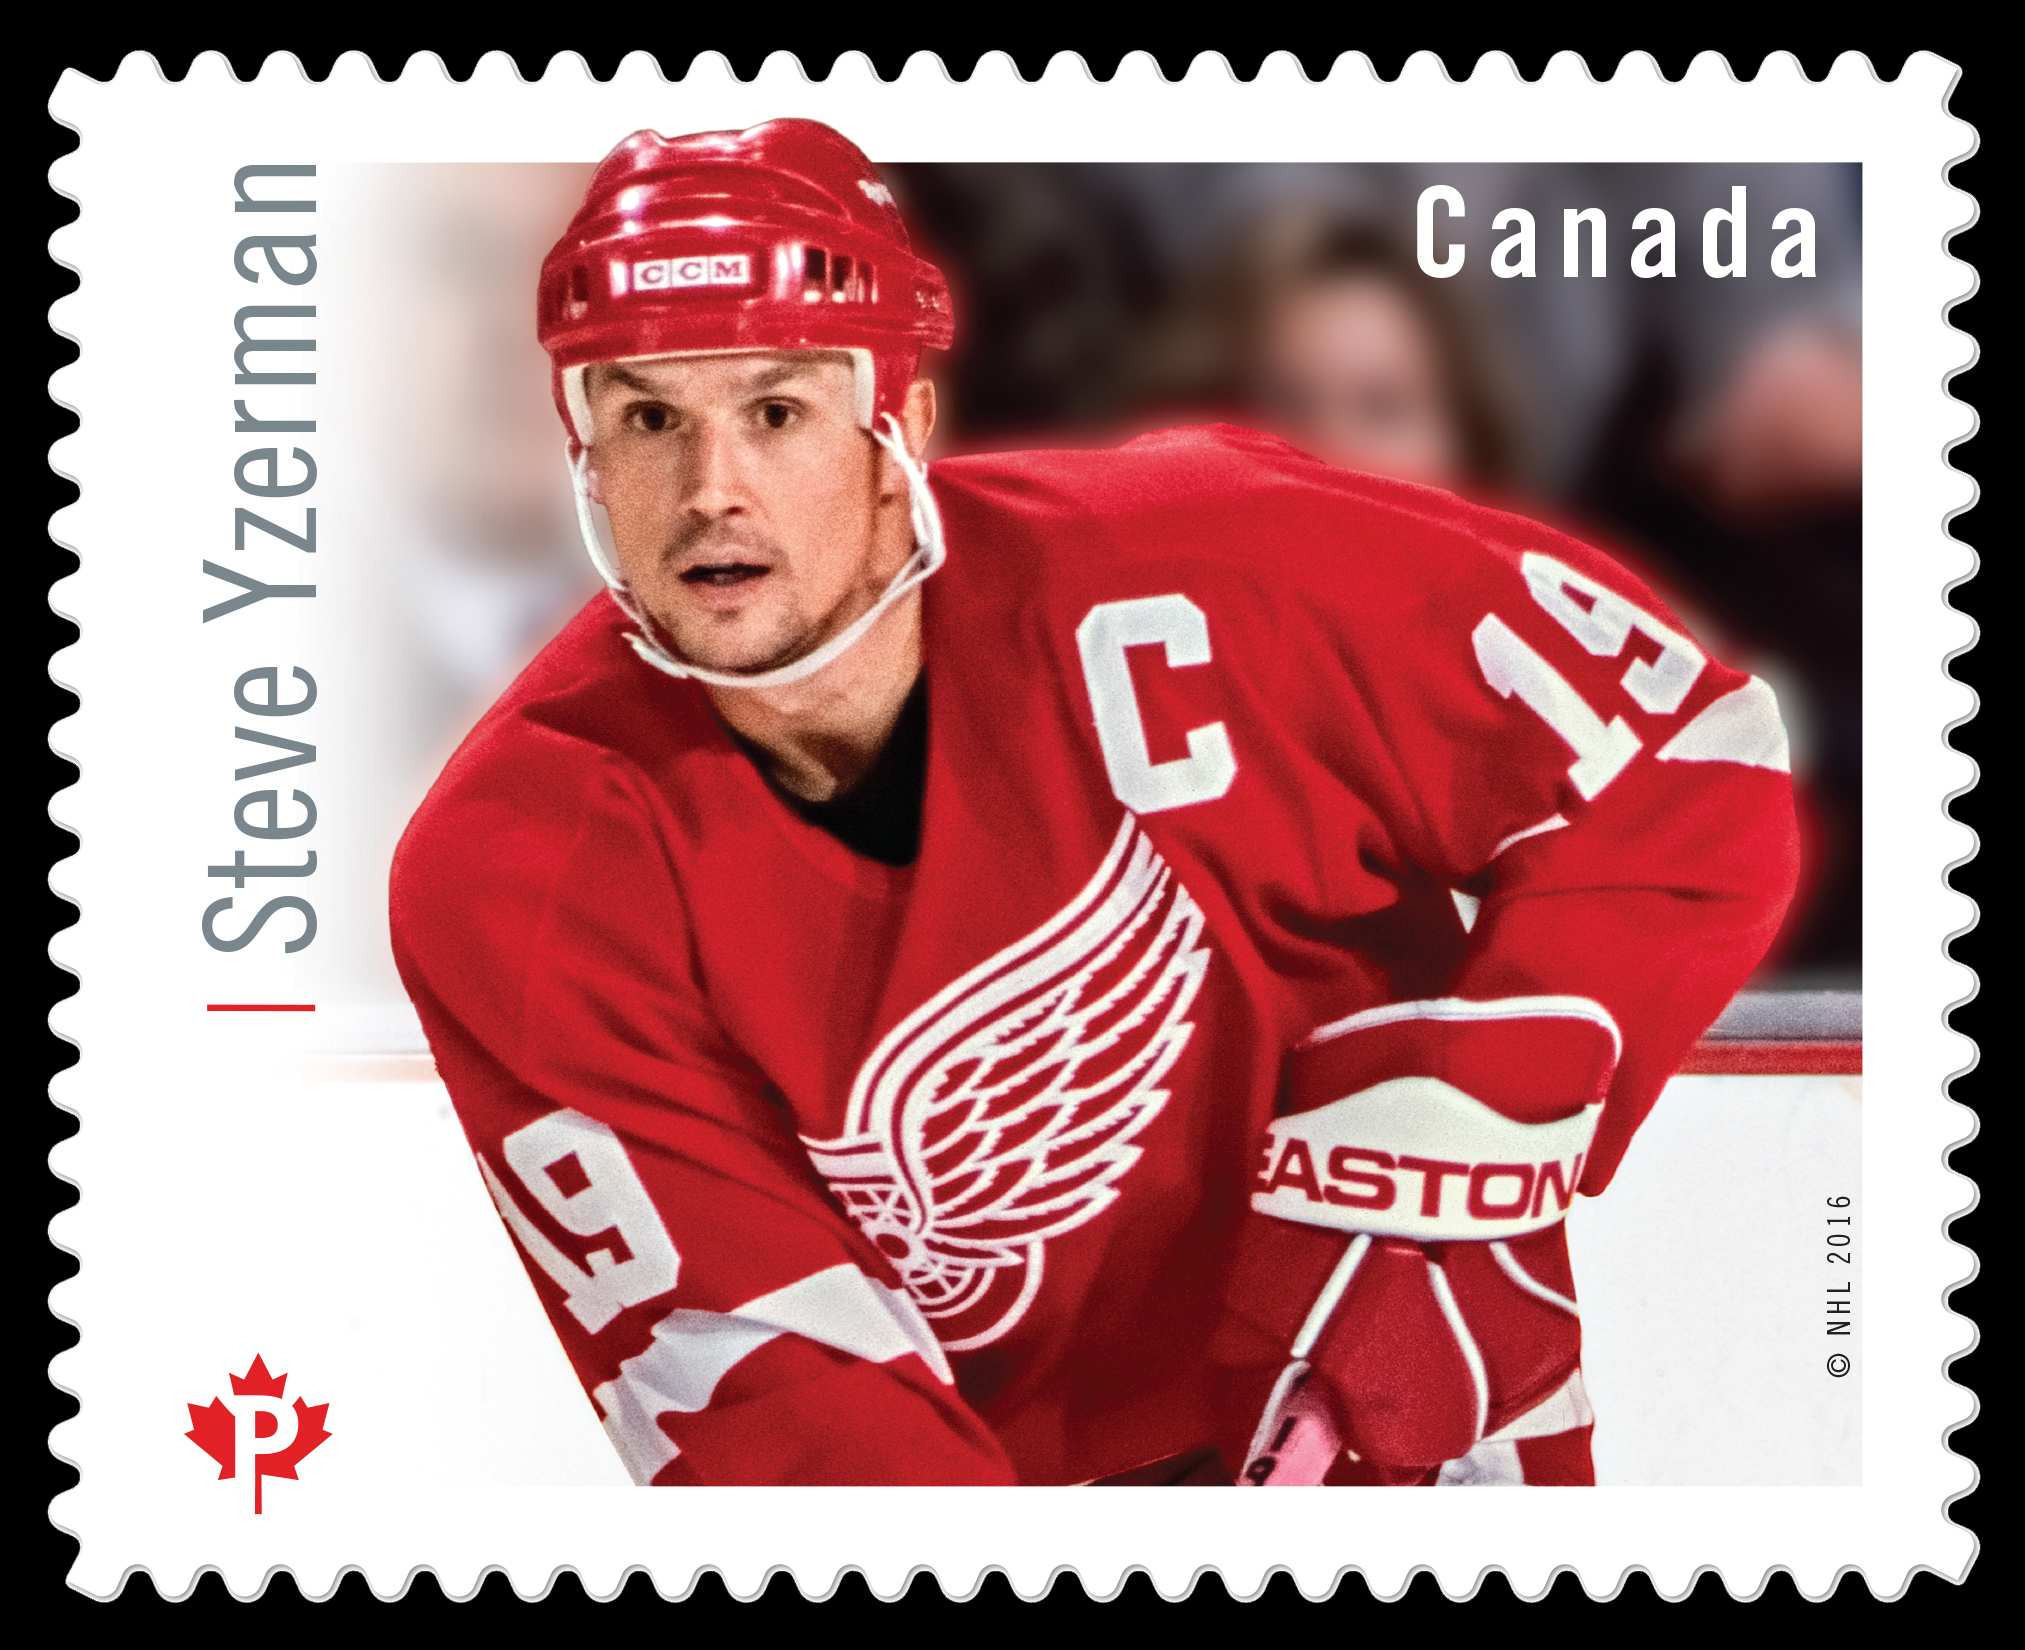 Steve Yzerman Canada Postage Stamp